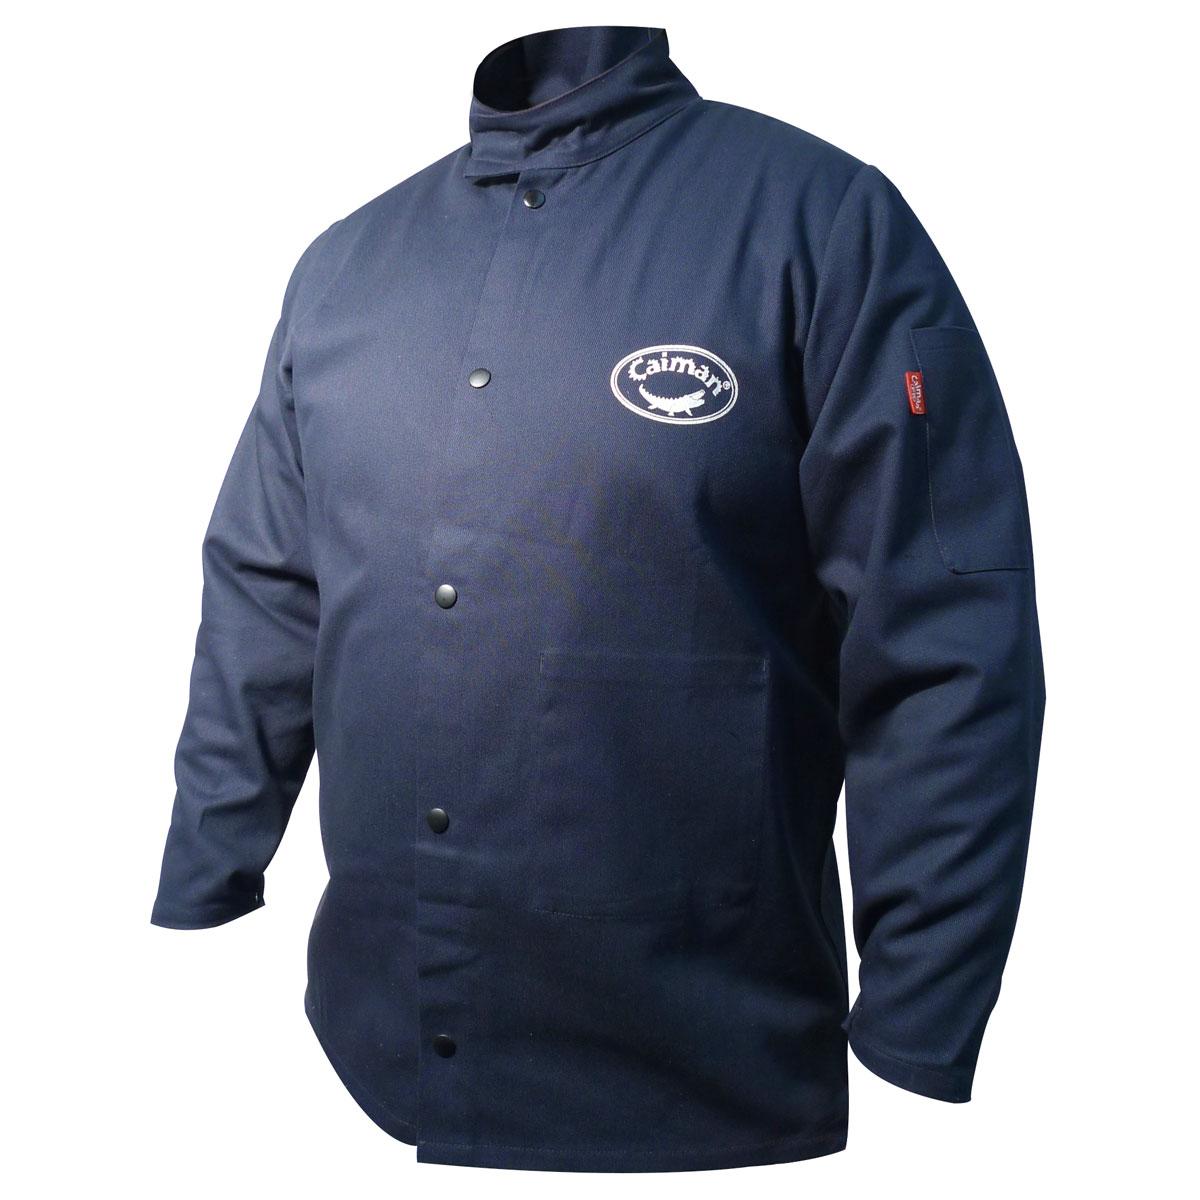 Caiman 3000 - FR Jacket